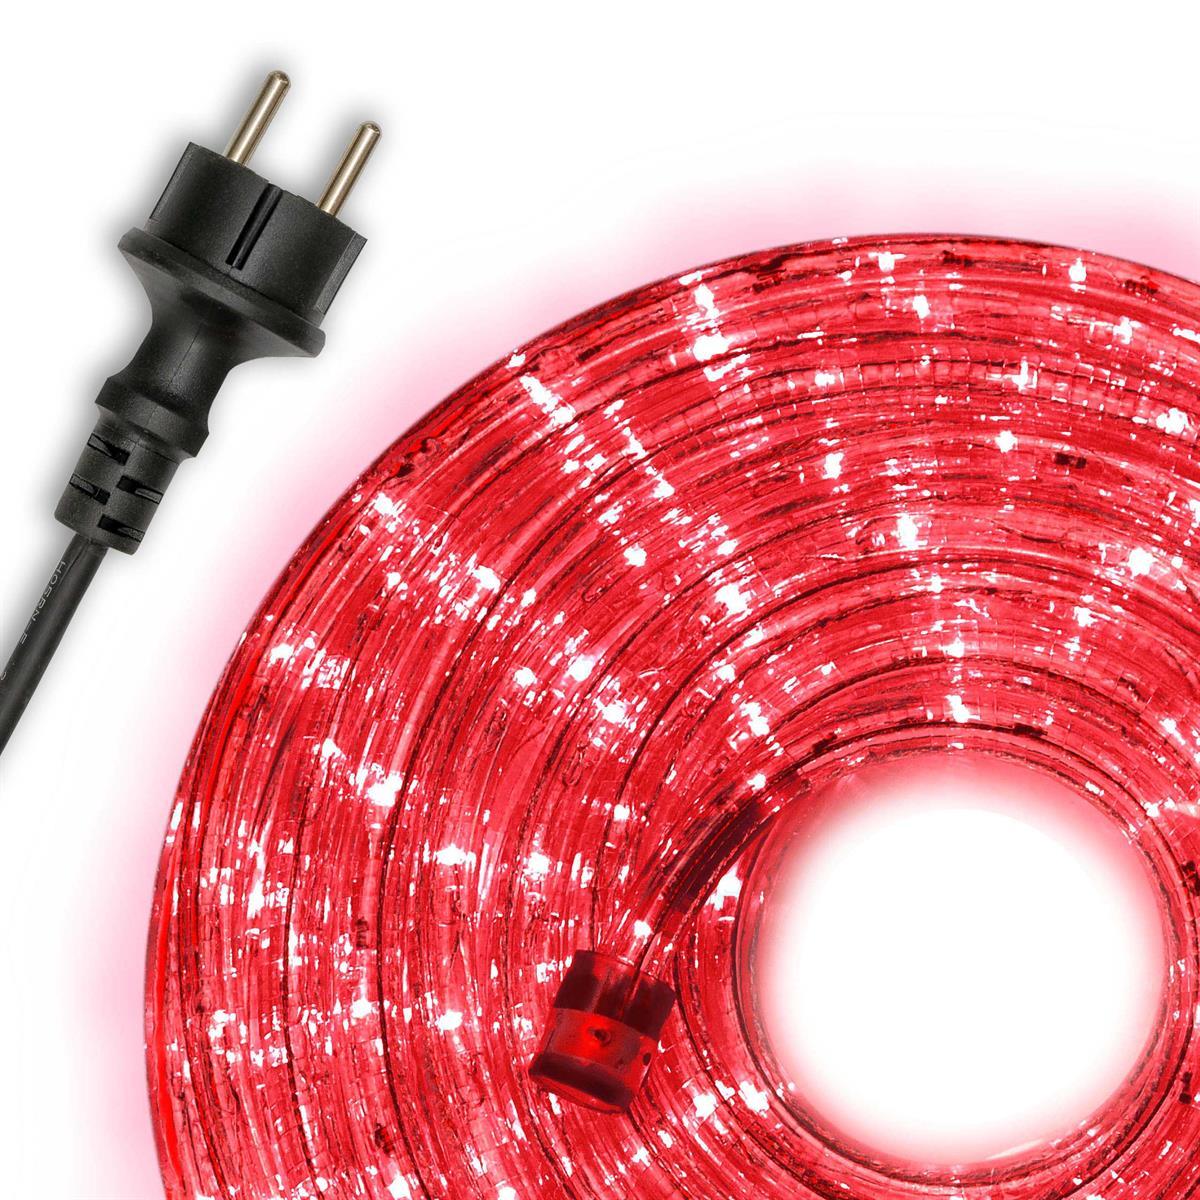 LED kabel